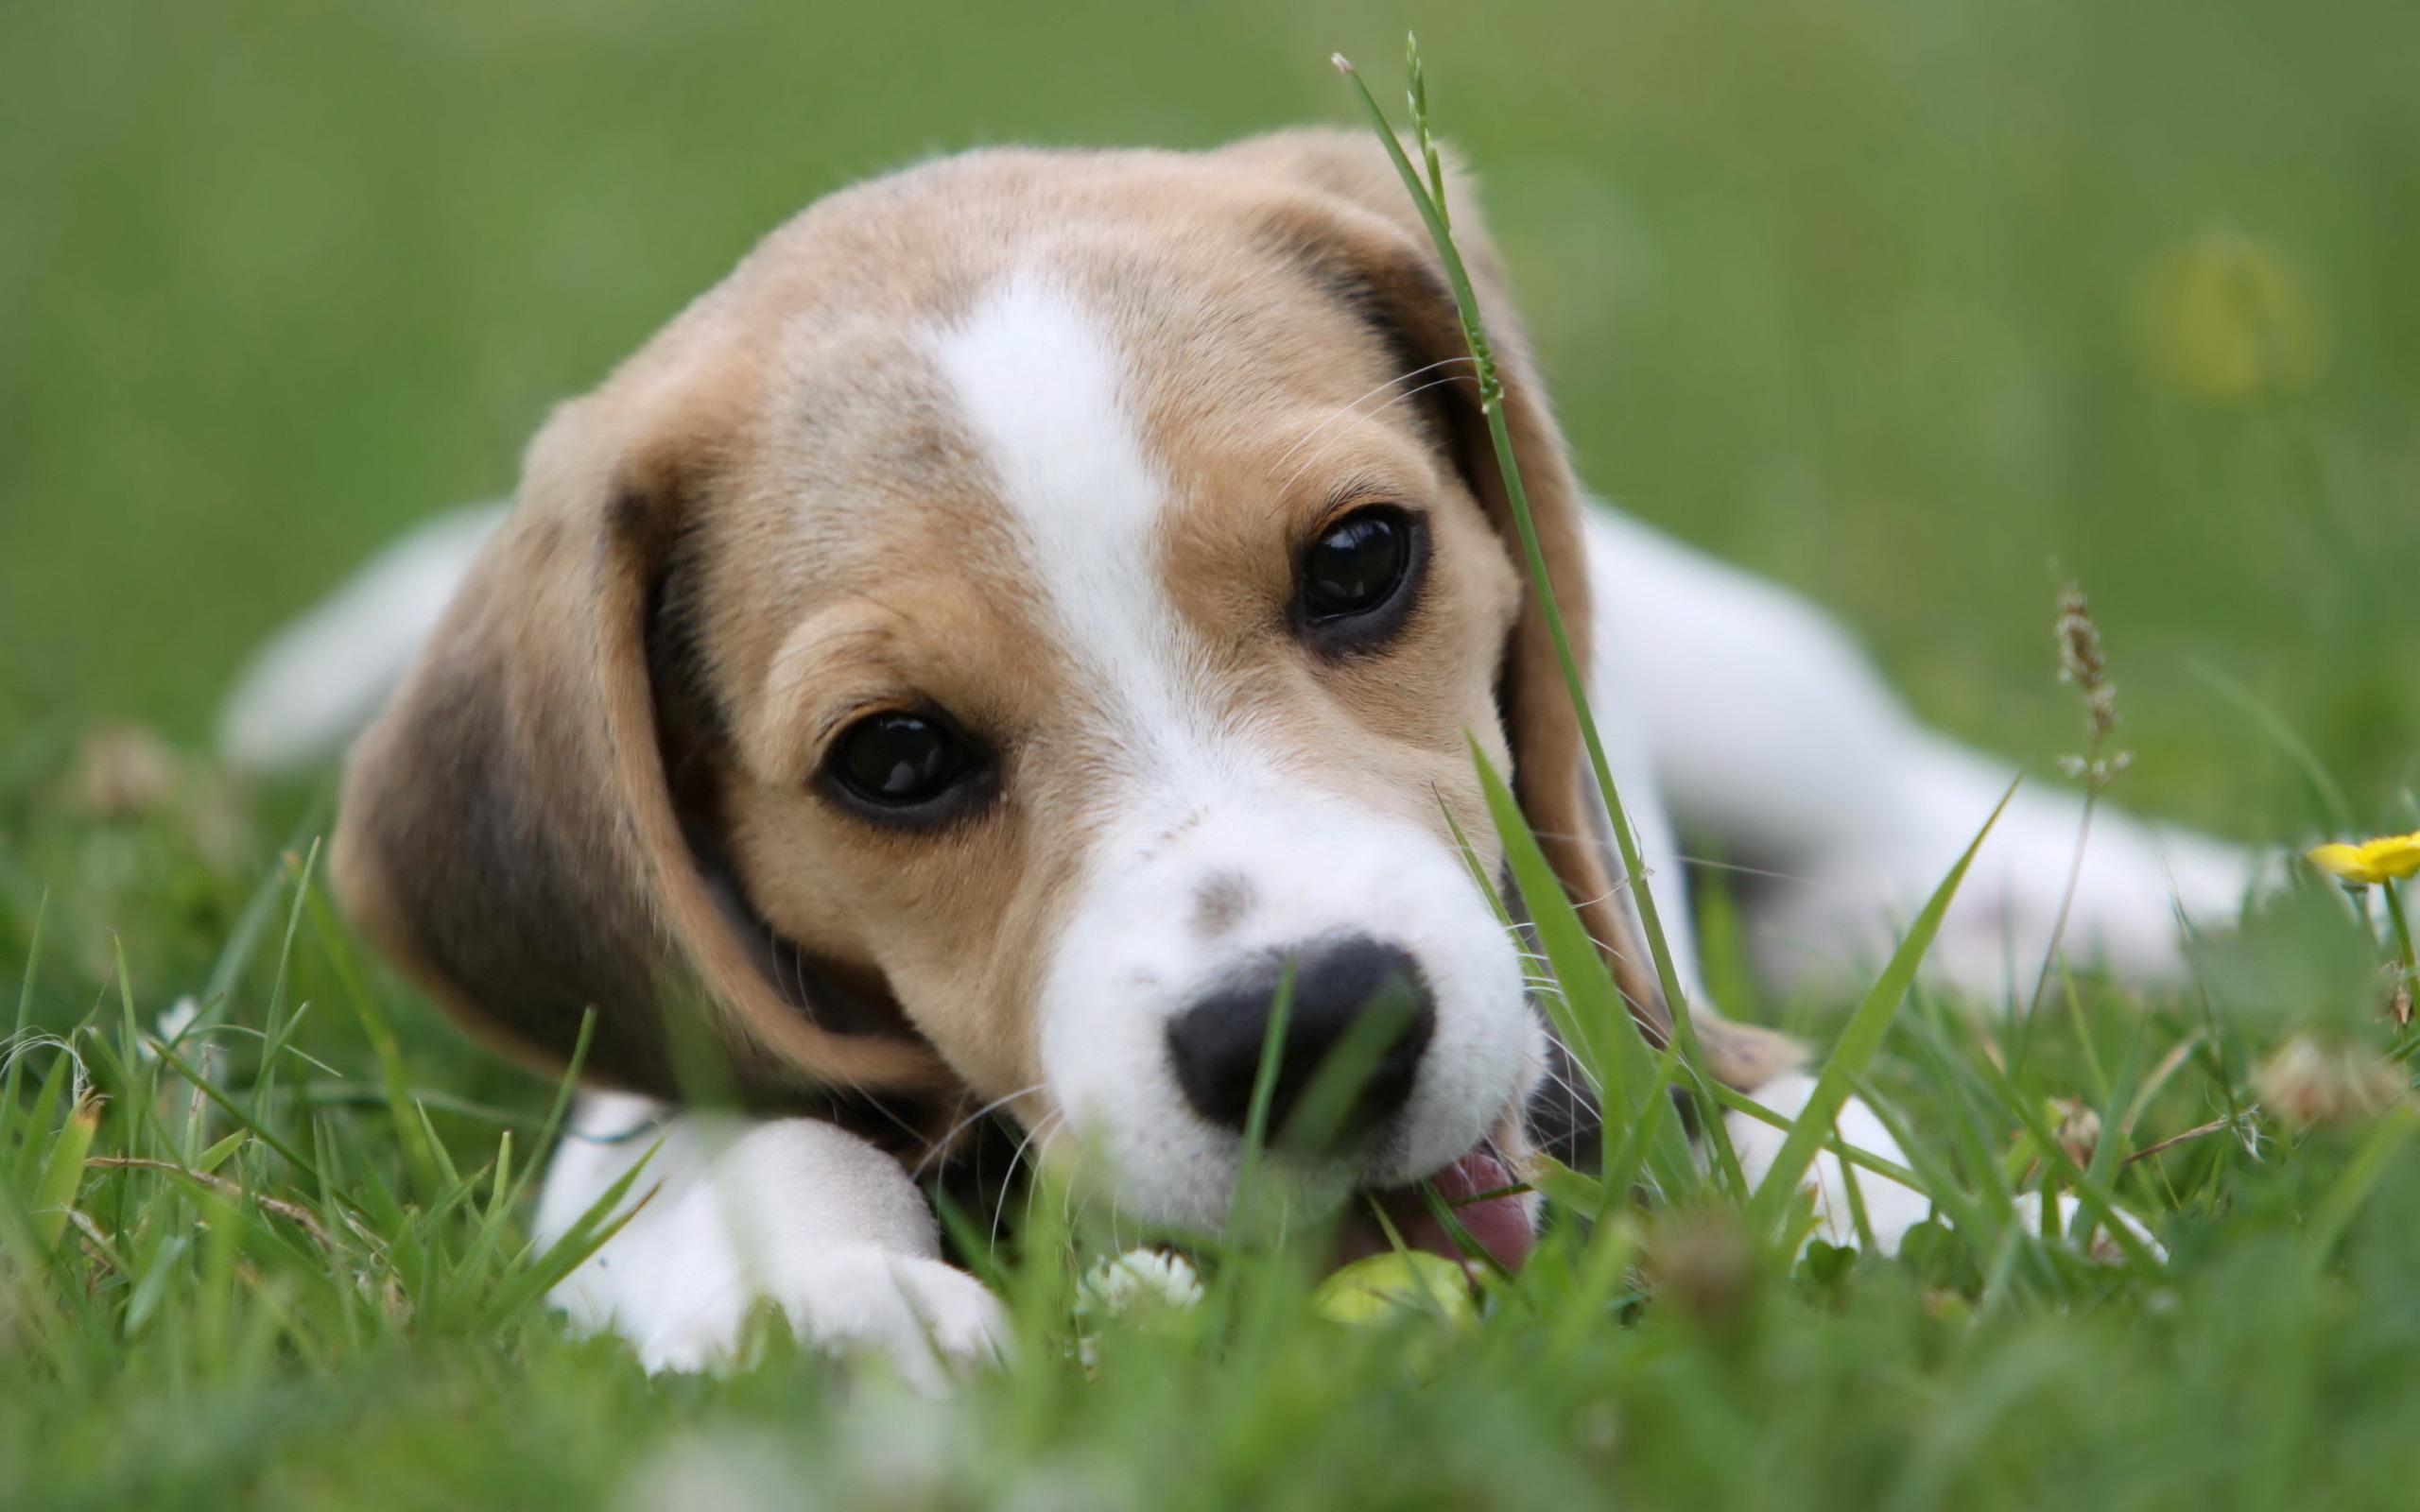 beagle dog wallpaper background 50051